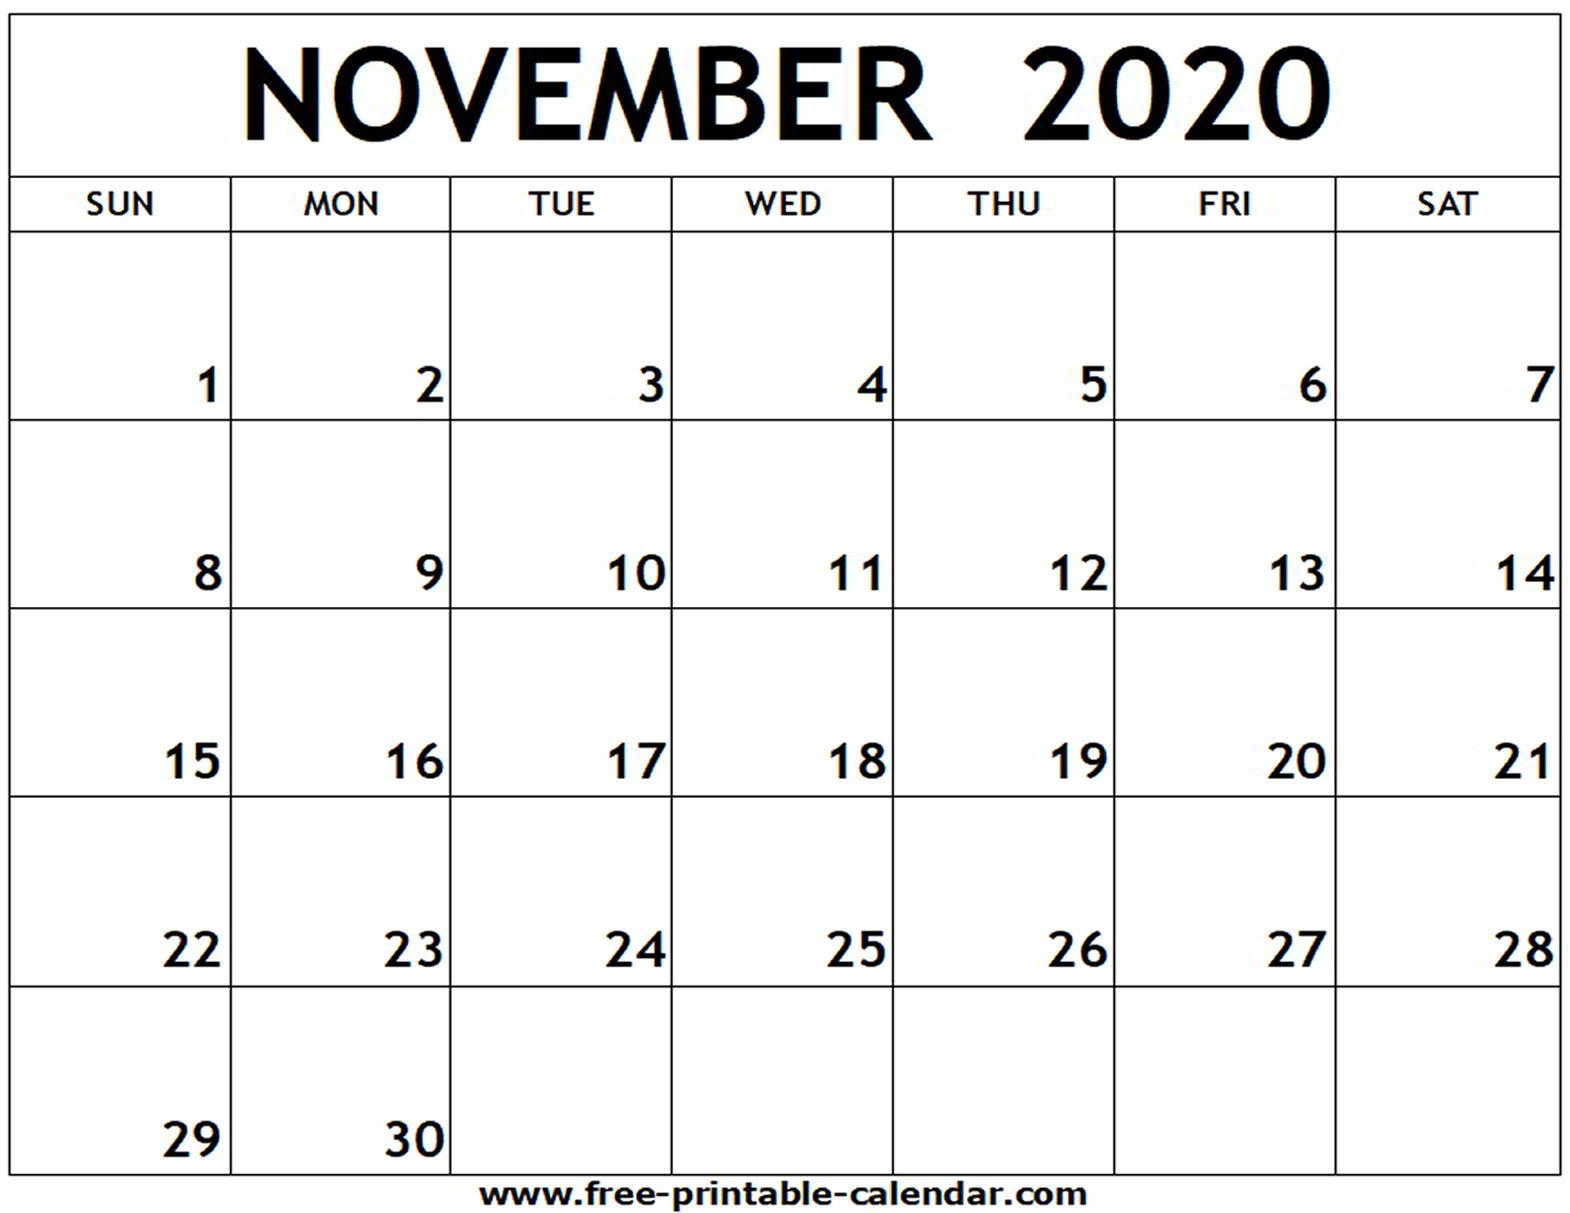 Blank Calendar November 2020 Pdf - Wpa.wpart.co